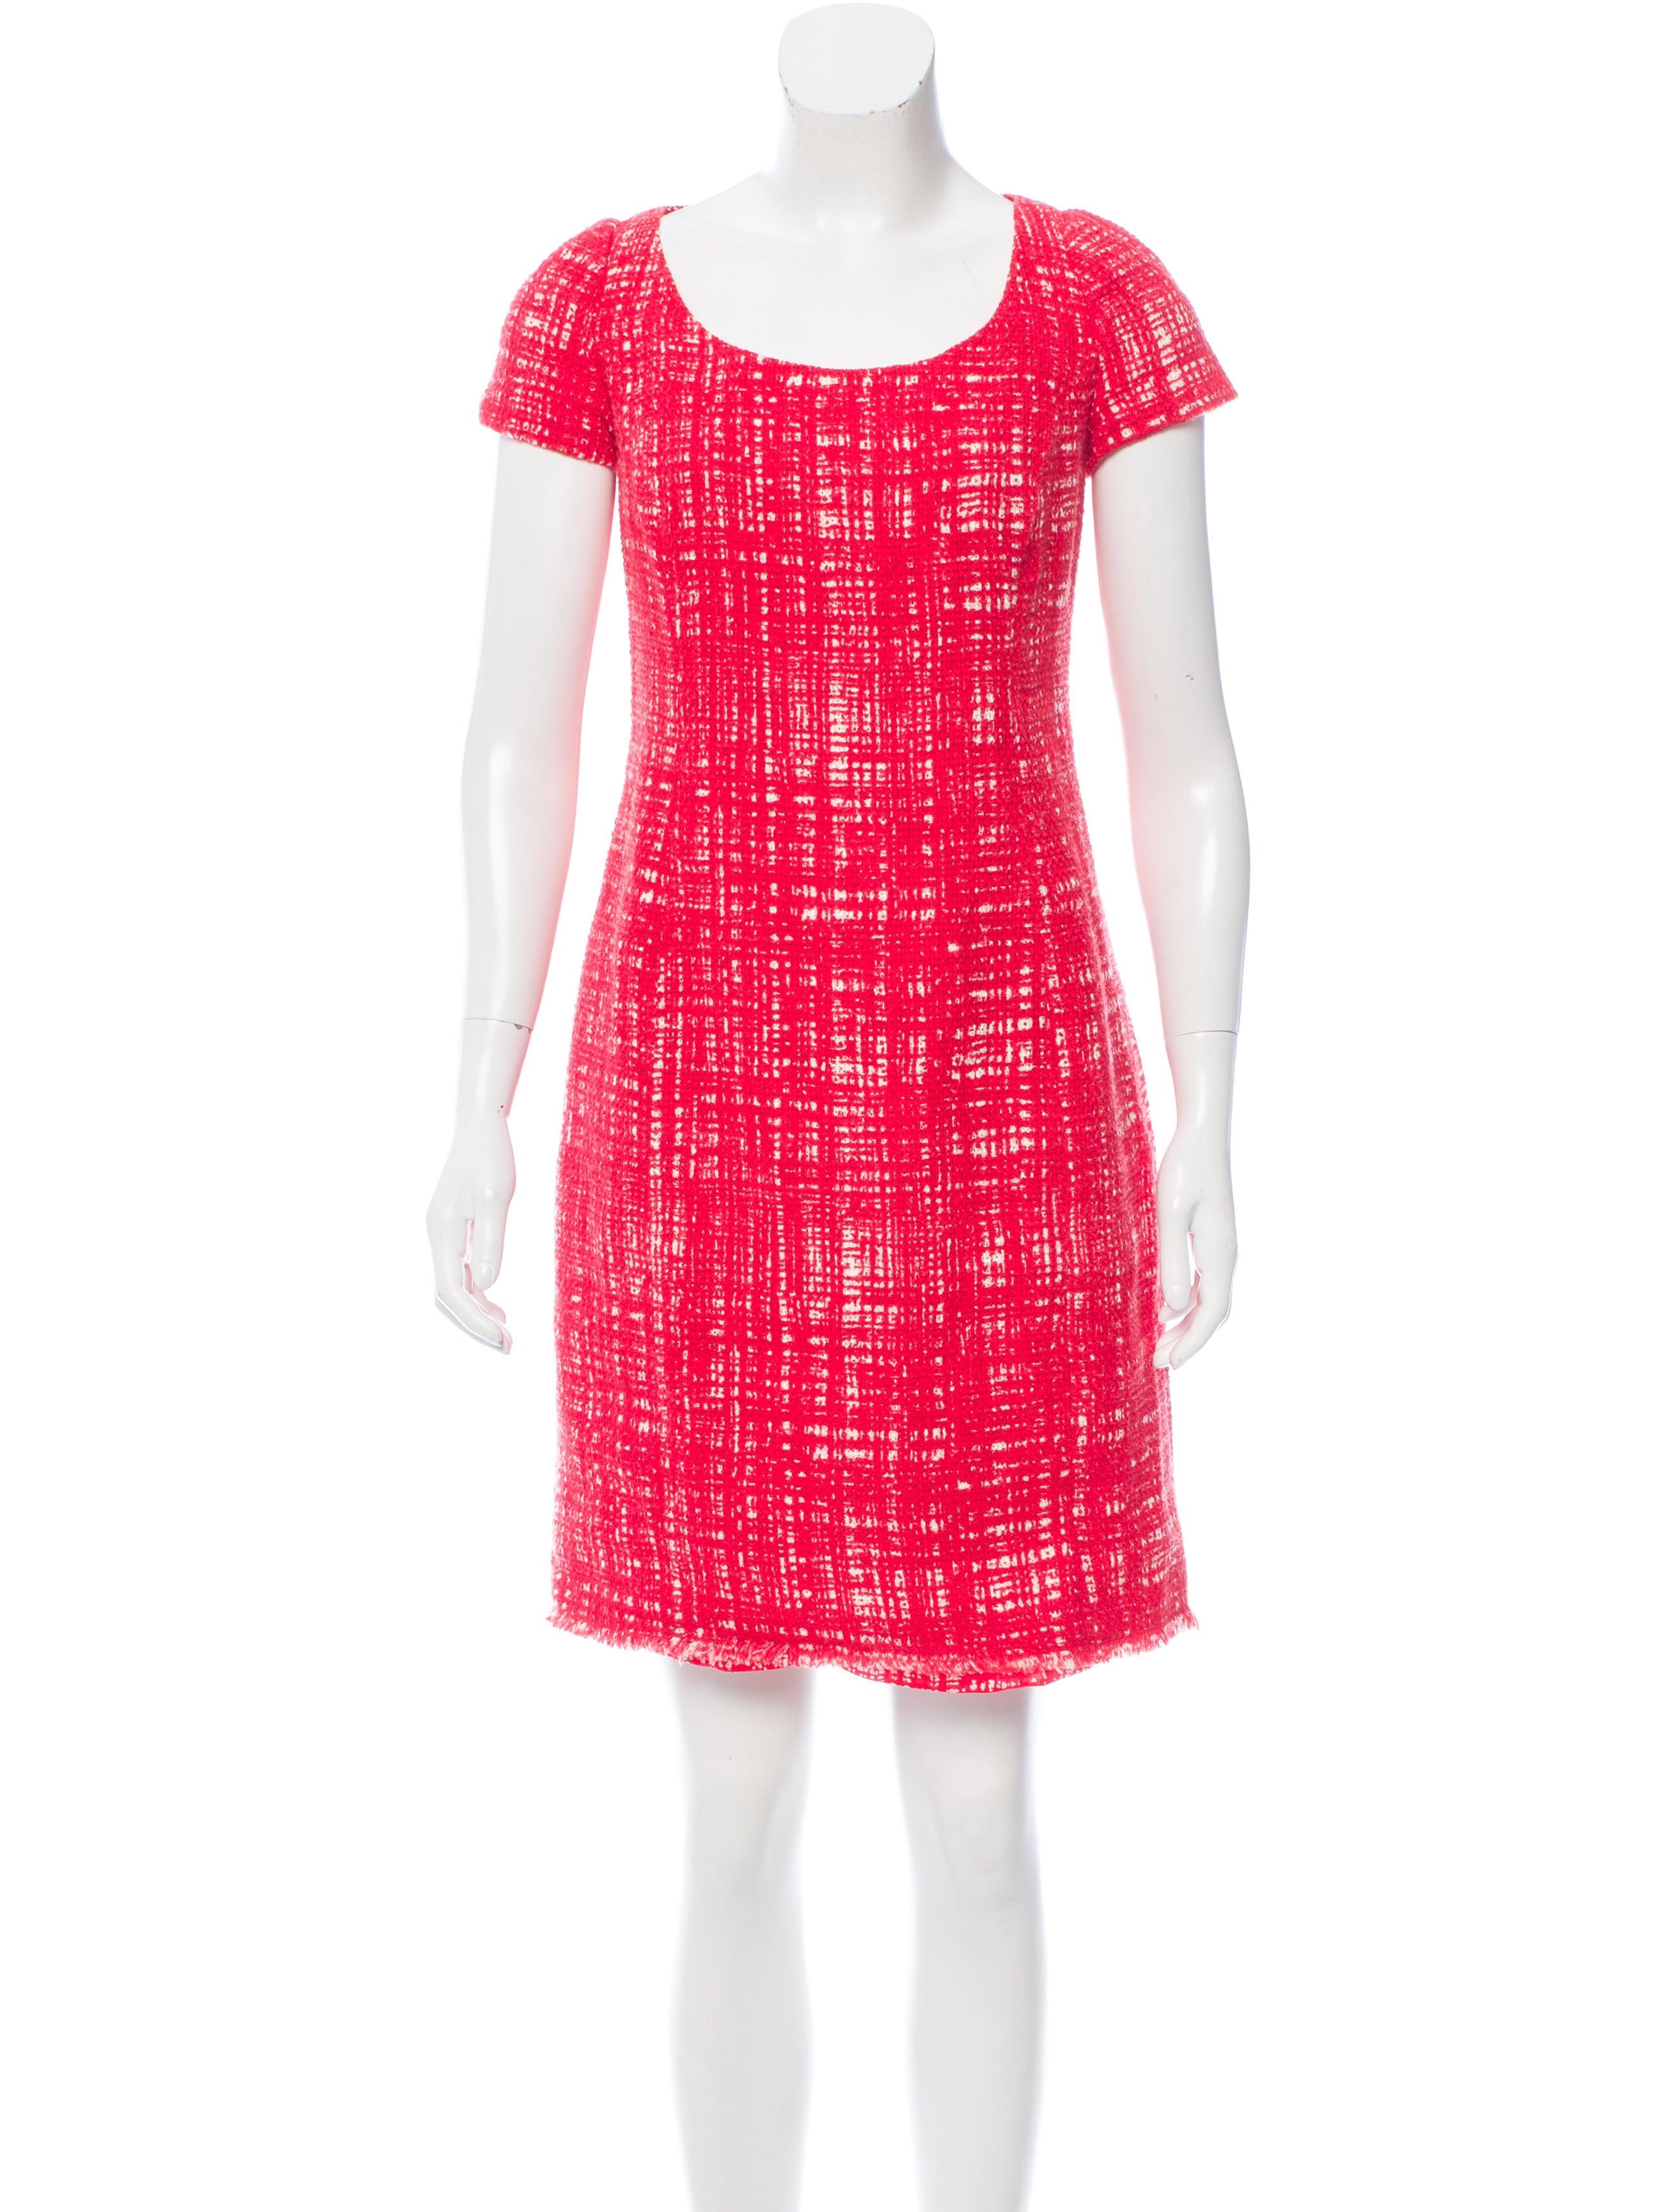 Prada raw edge tweed dress clothing pra141350 the for Raw edge t shirt women s